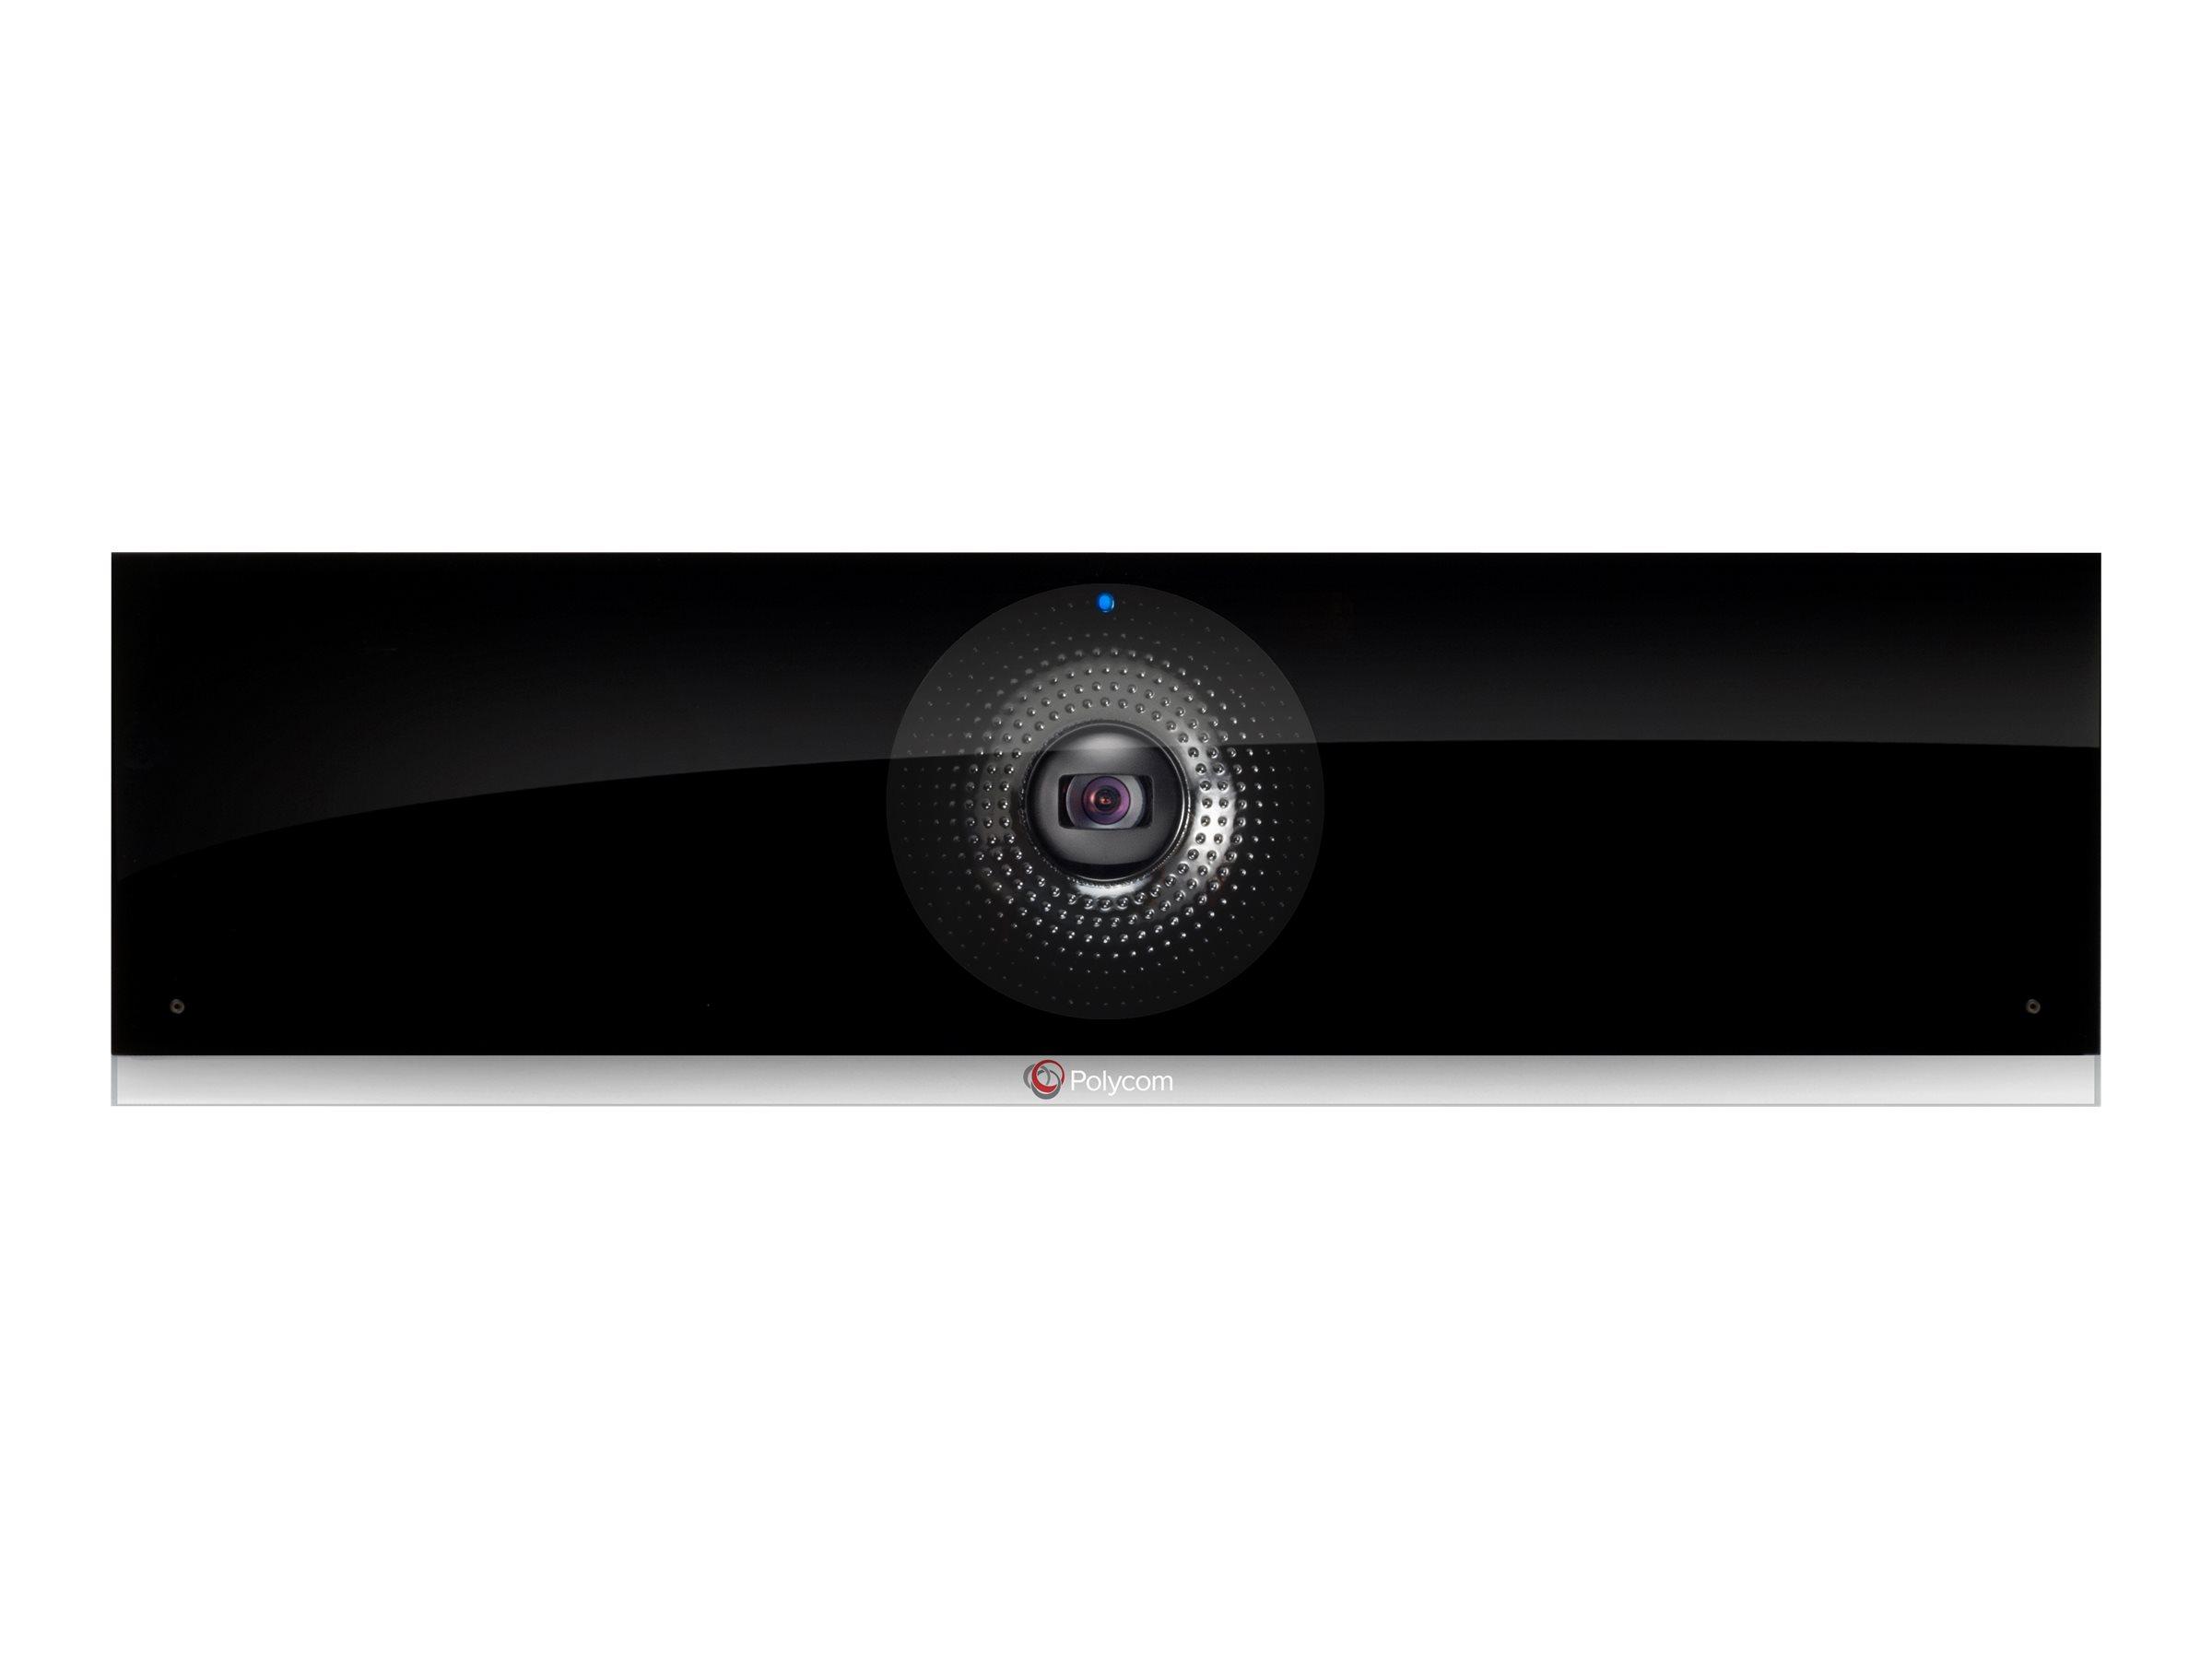 Polycom RealPresence Debut - Videokonferenzkomponente